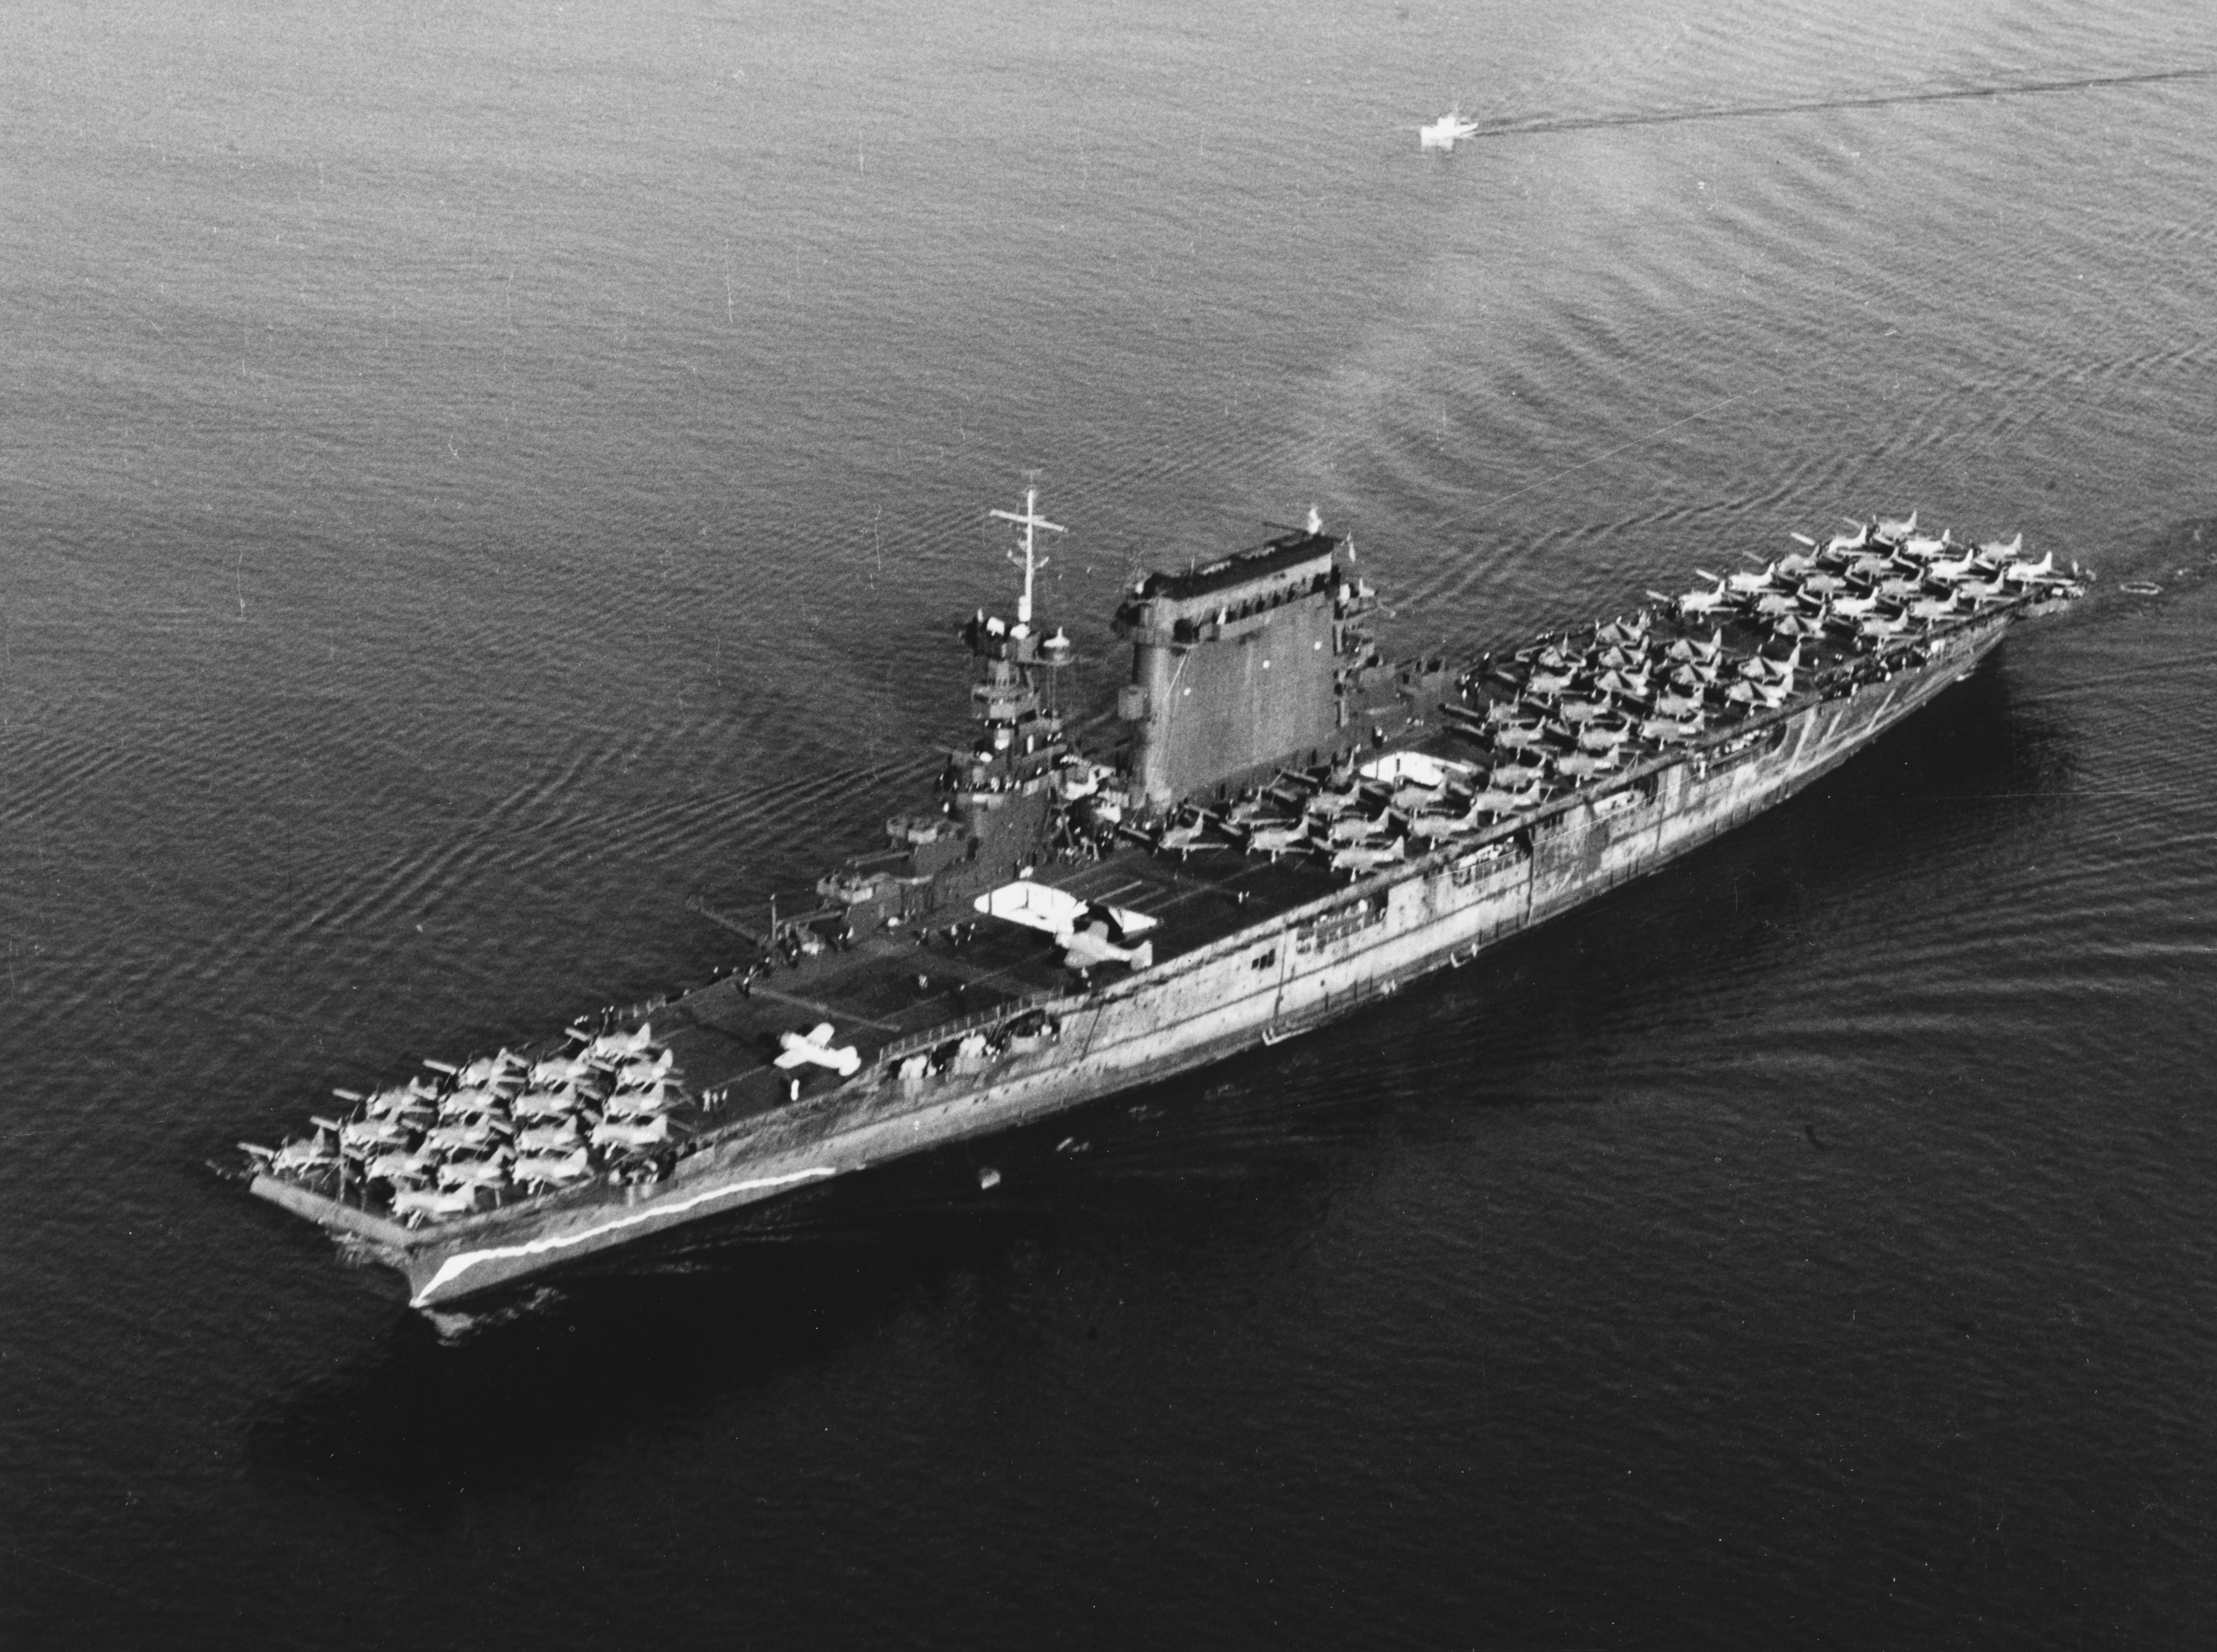 Uss Lexington Cv 2 Wikipedia Top Gt Cushman Wiring Diagrams Diagramjpg Leaving San Diego On 14 October 1941 80